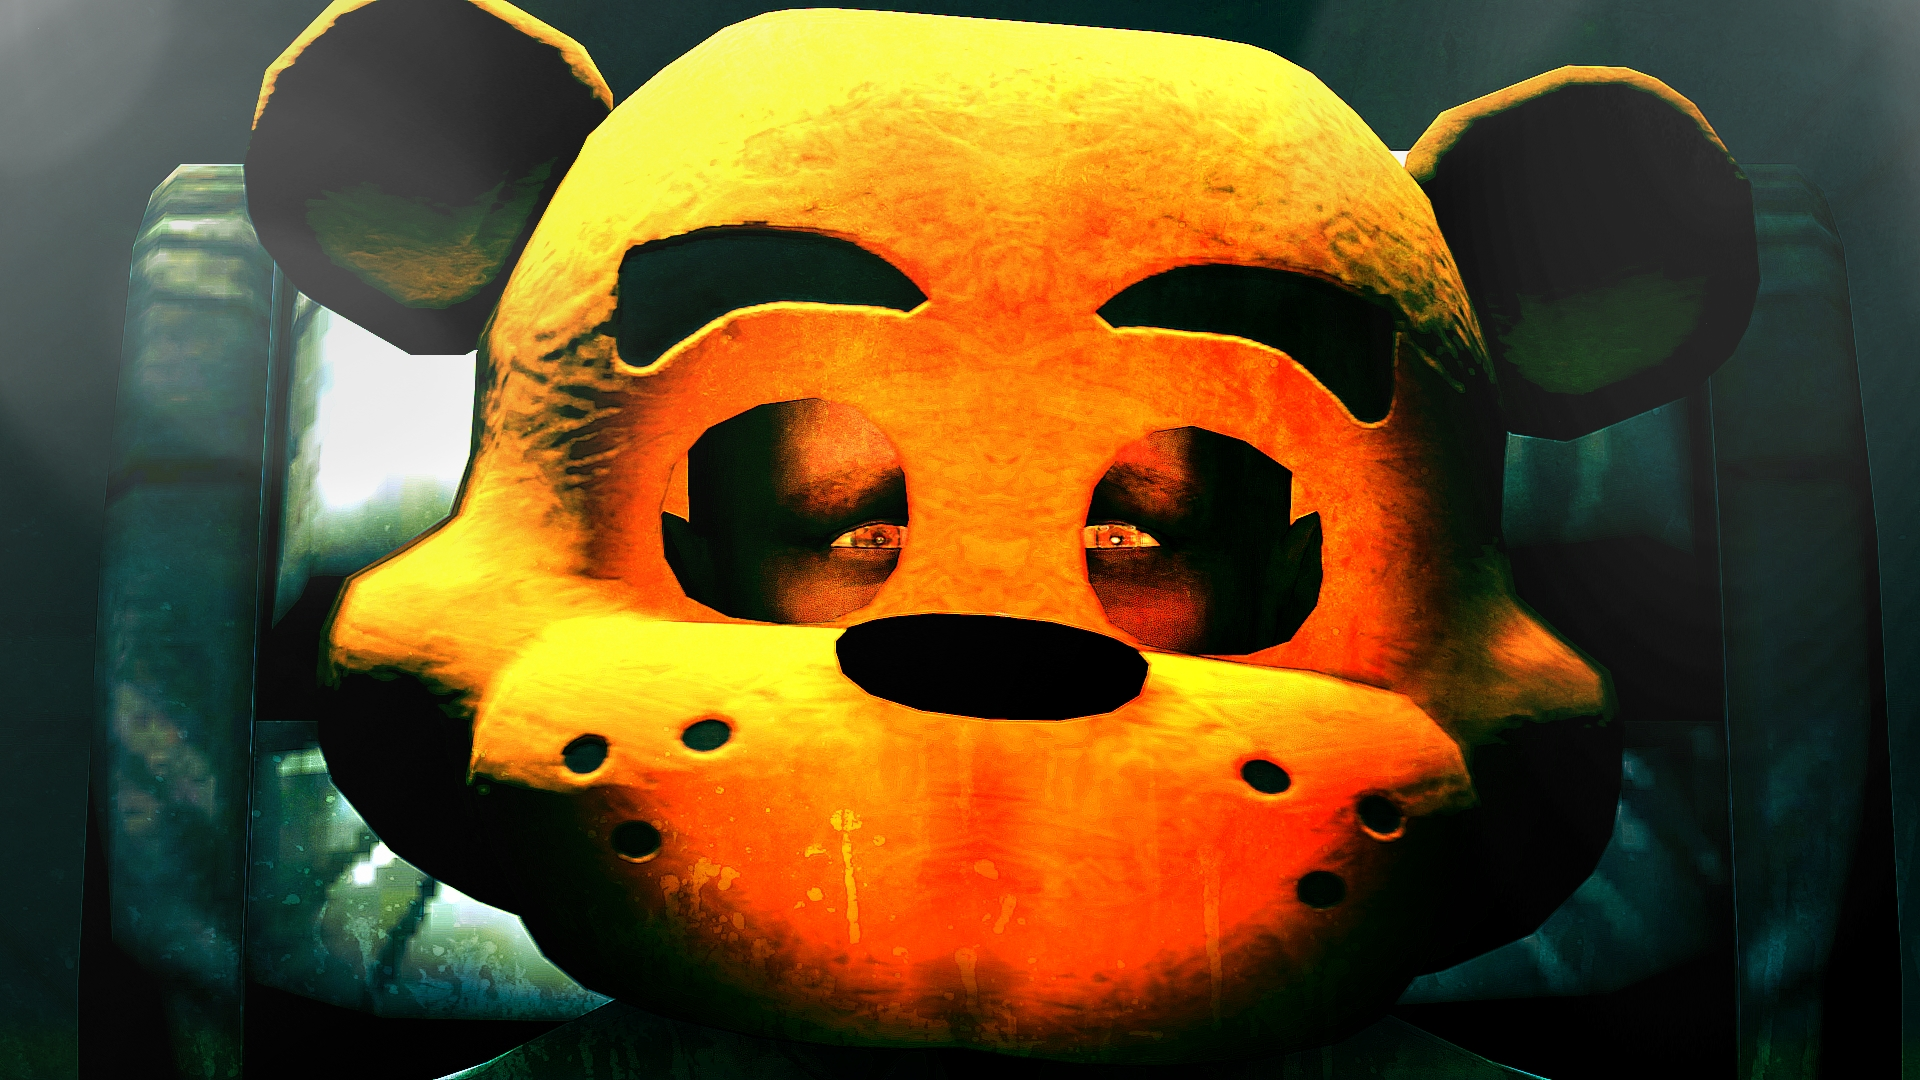 Working Improved Freddy Mask Roblox Steam Workshop Fnaf 2 Prop Freddy Mask